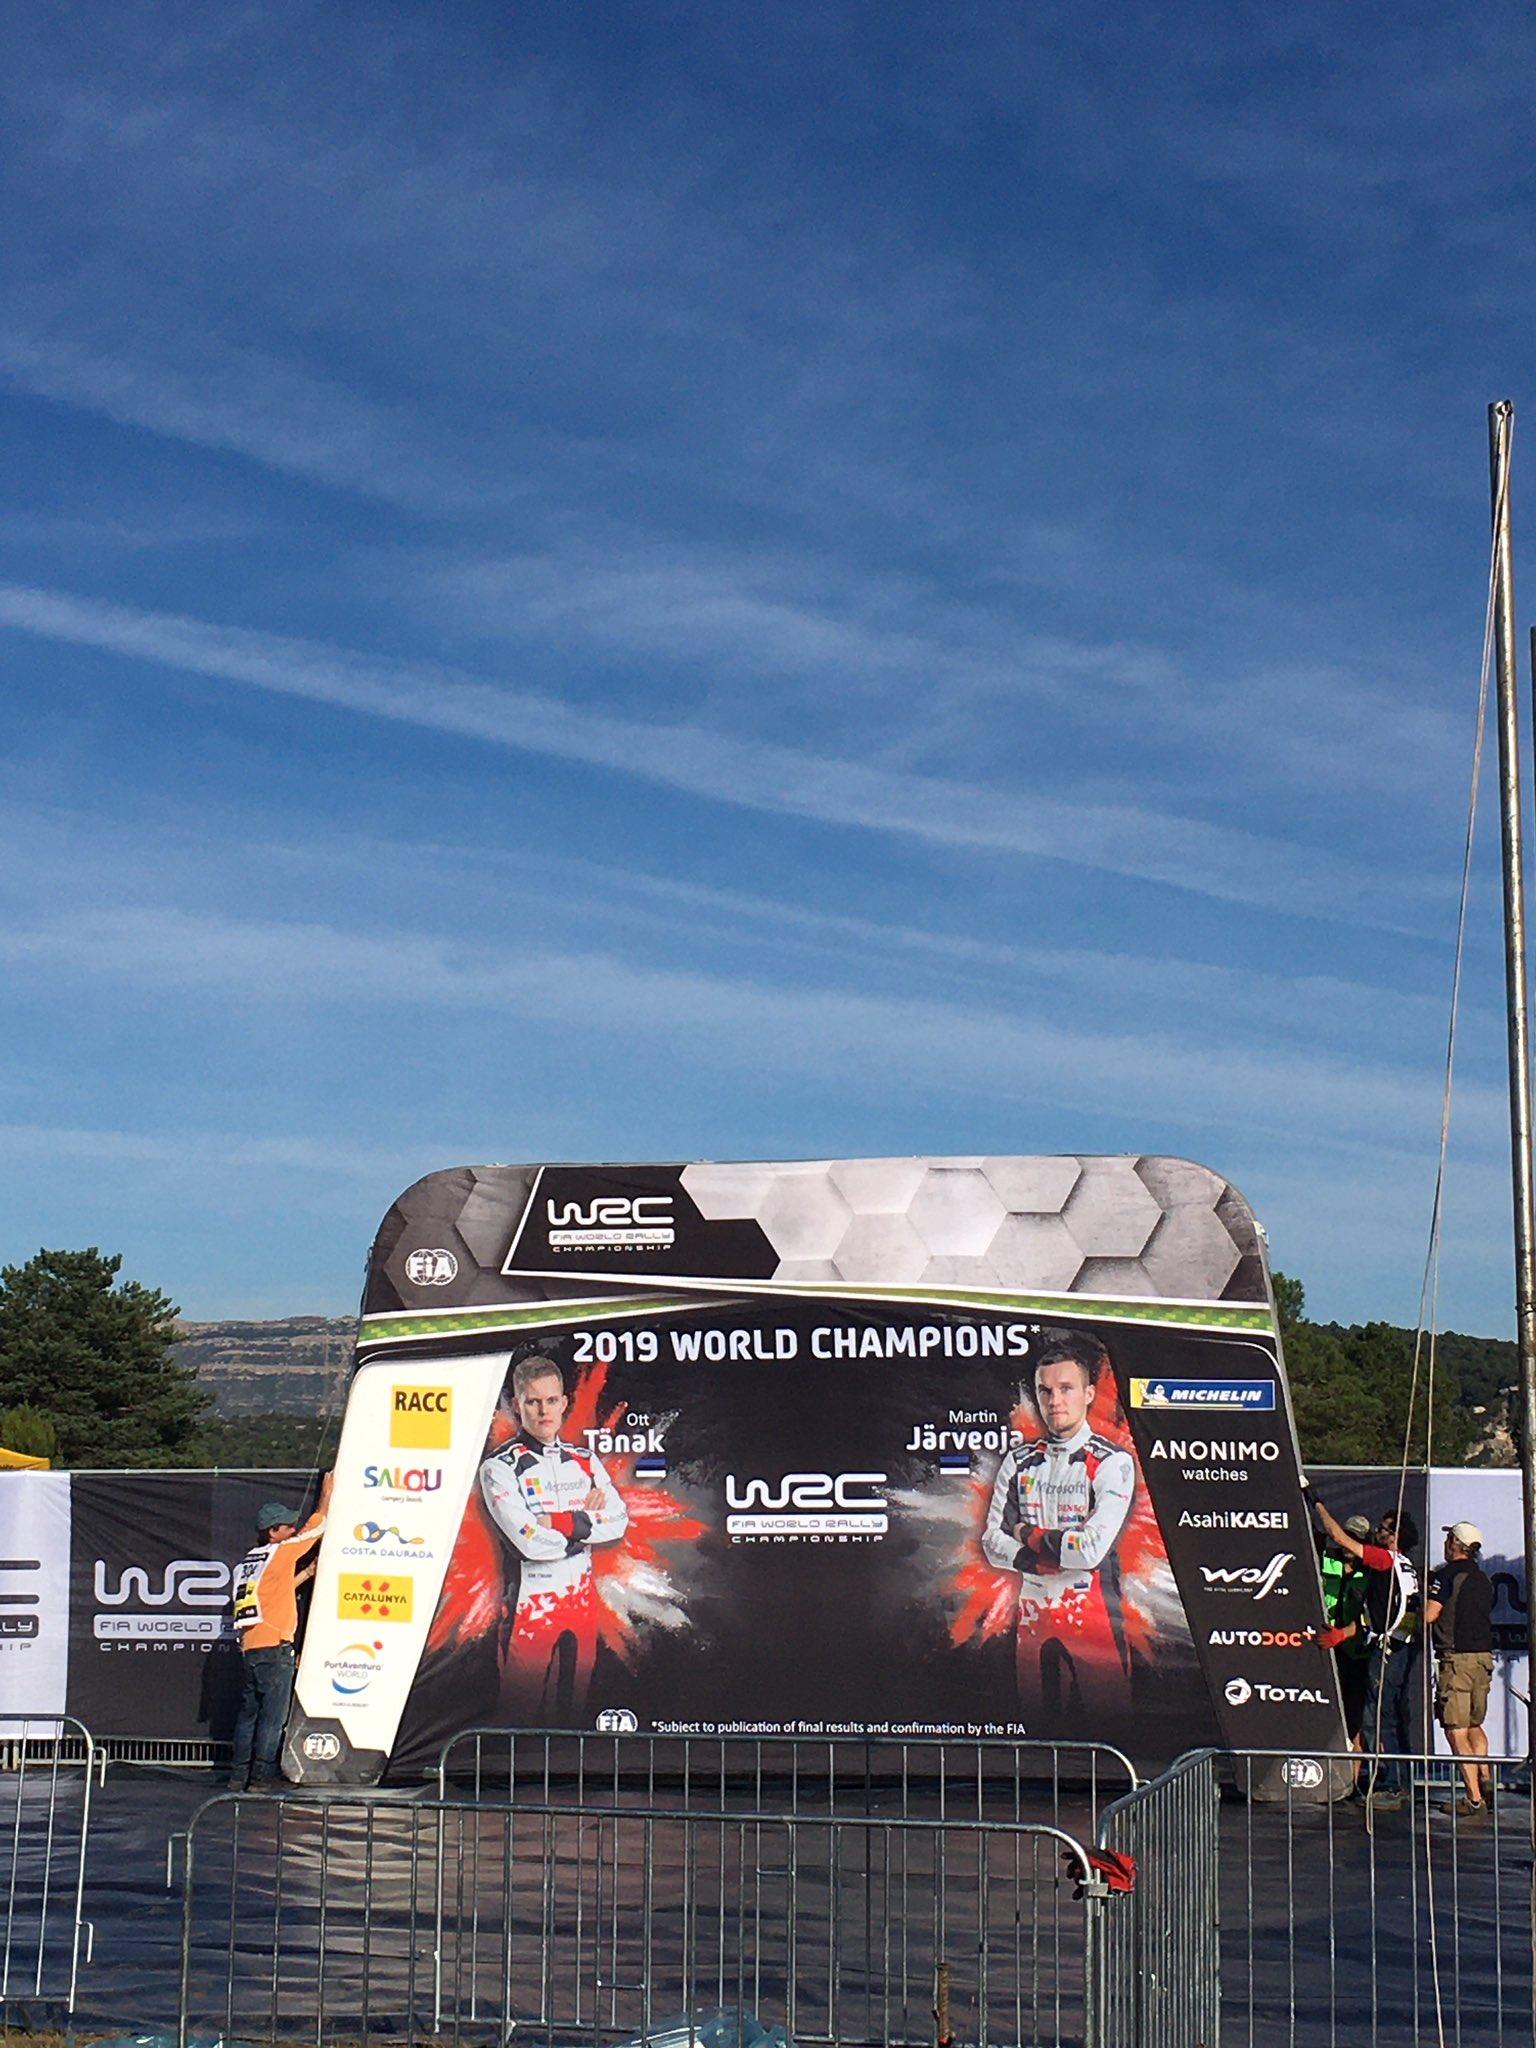 WRC: 55º RallyRACC Catalunya - Costa Daurada - Rally de España [24-27 Octubre] - Página 11 EH35oR7XUAEgxV1?format=jpg&name=4096x4096